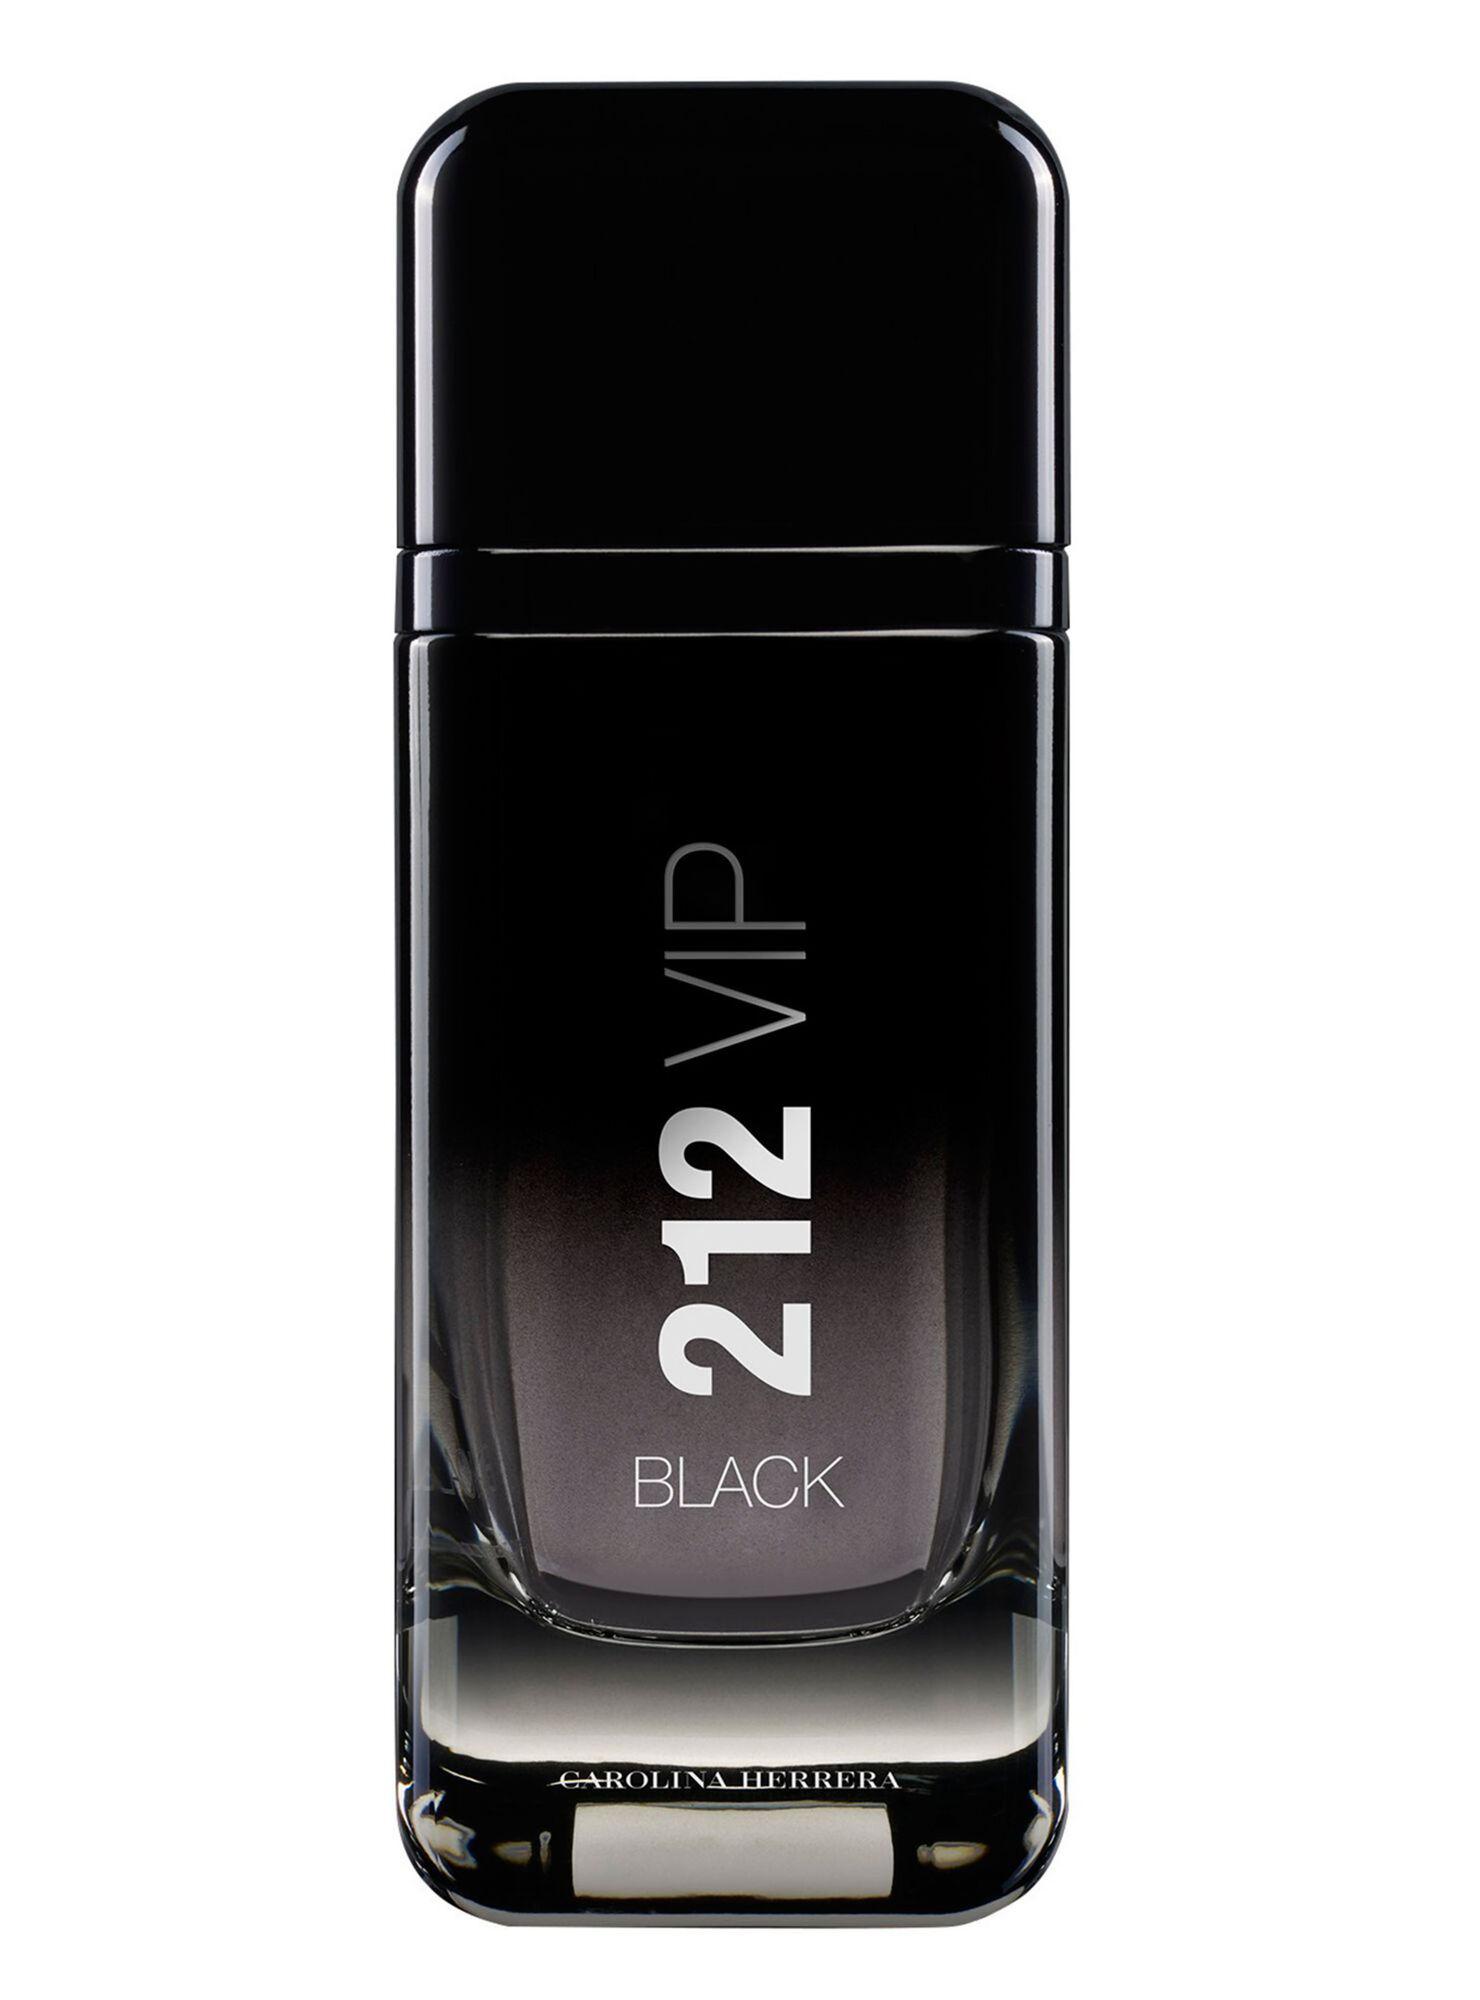 Set Perfume Carolina Herrera 212 Vip Black Men EDP 100 ml + Shower ... 47ba7d02da